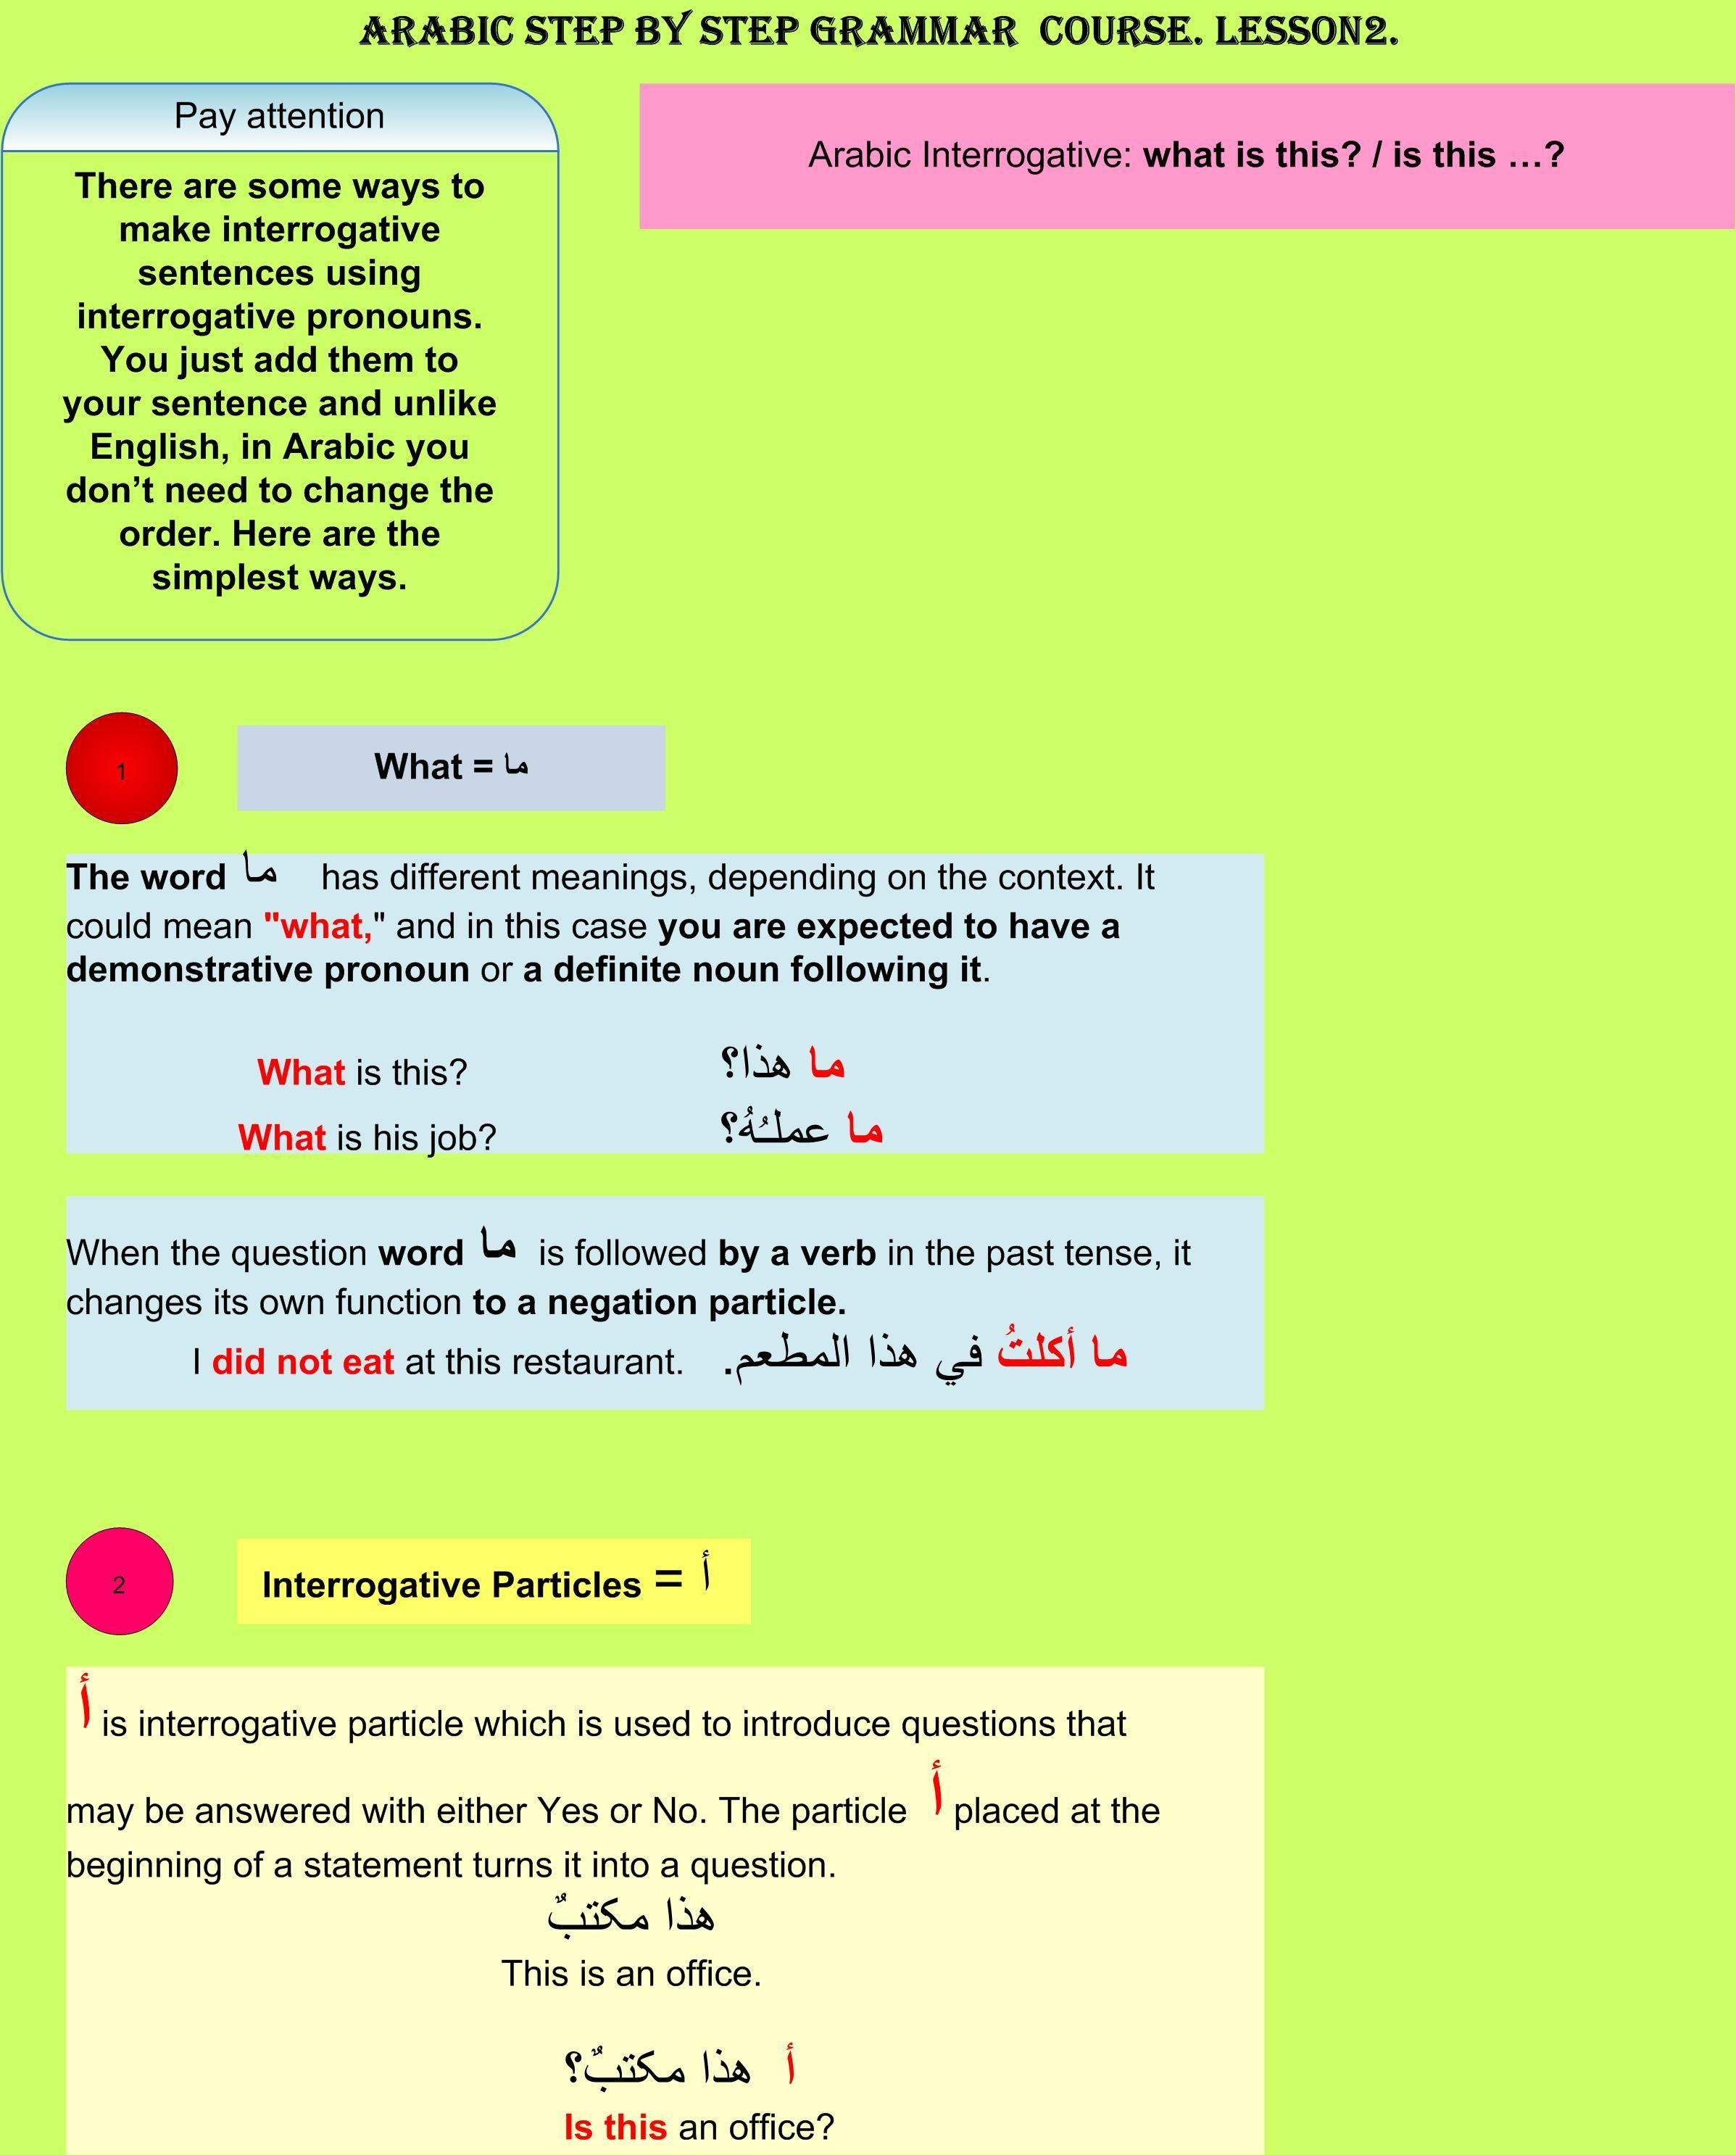 Arabic Step By Step Grammar Course Lesson 2